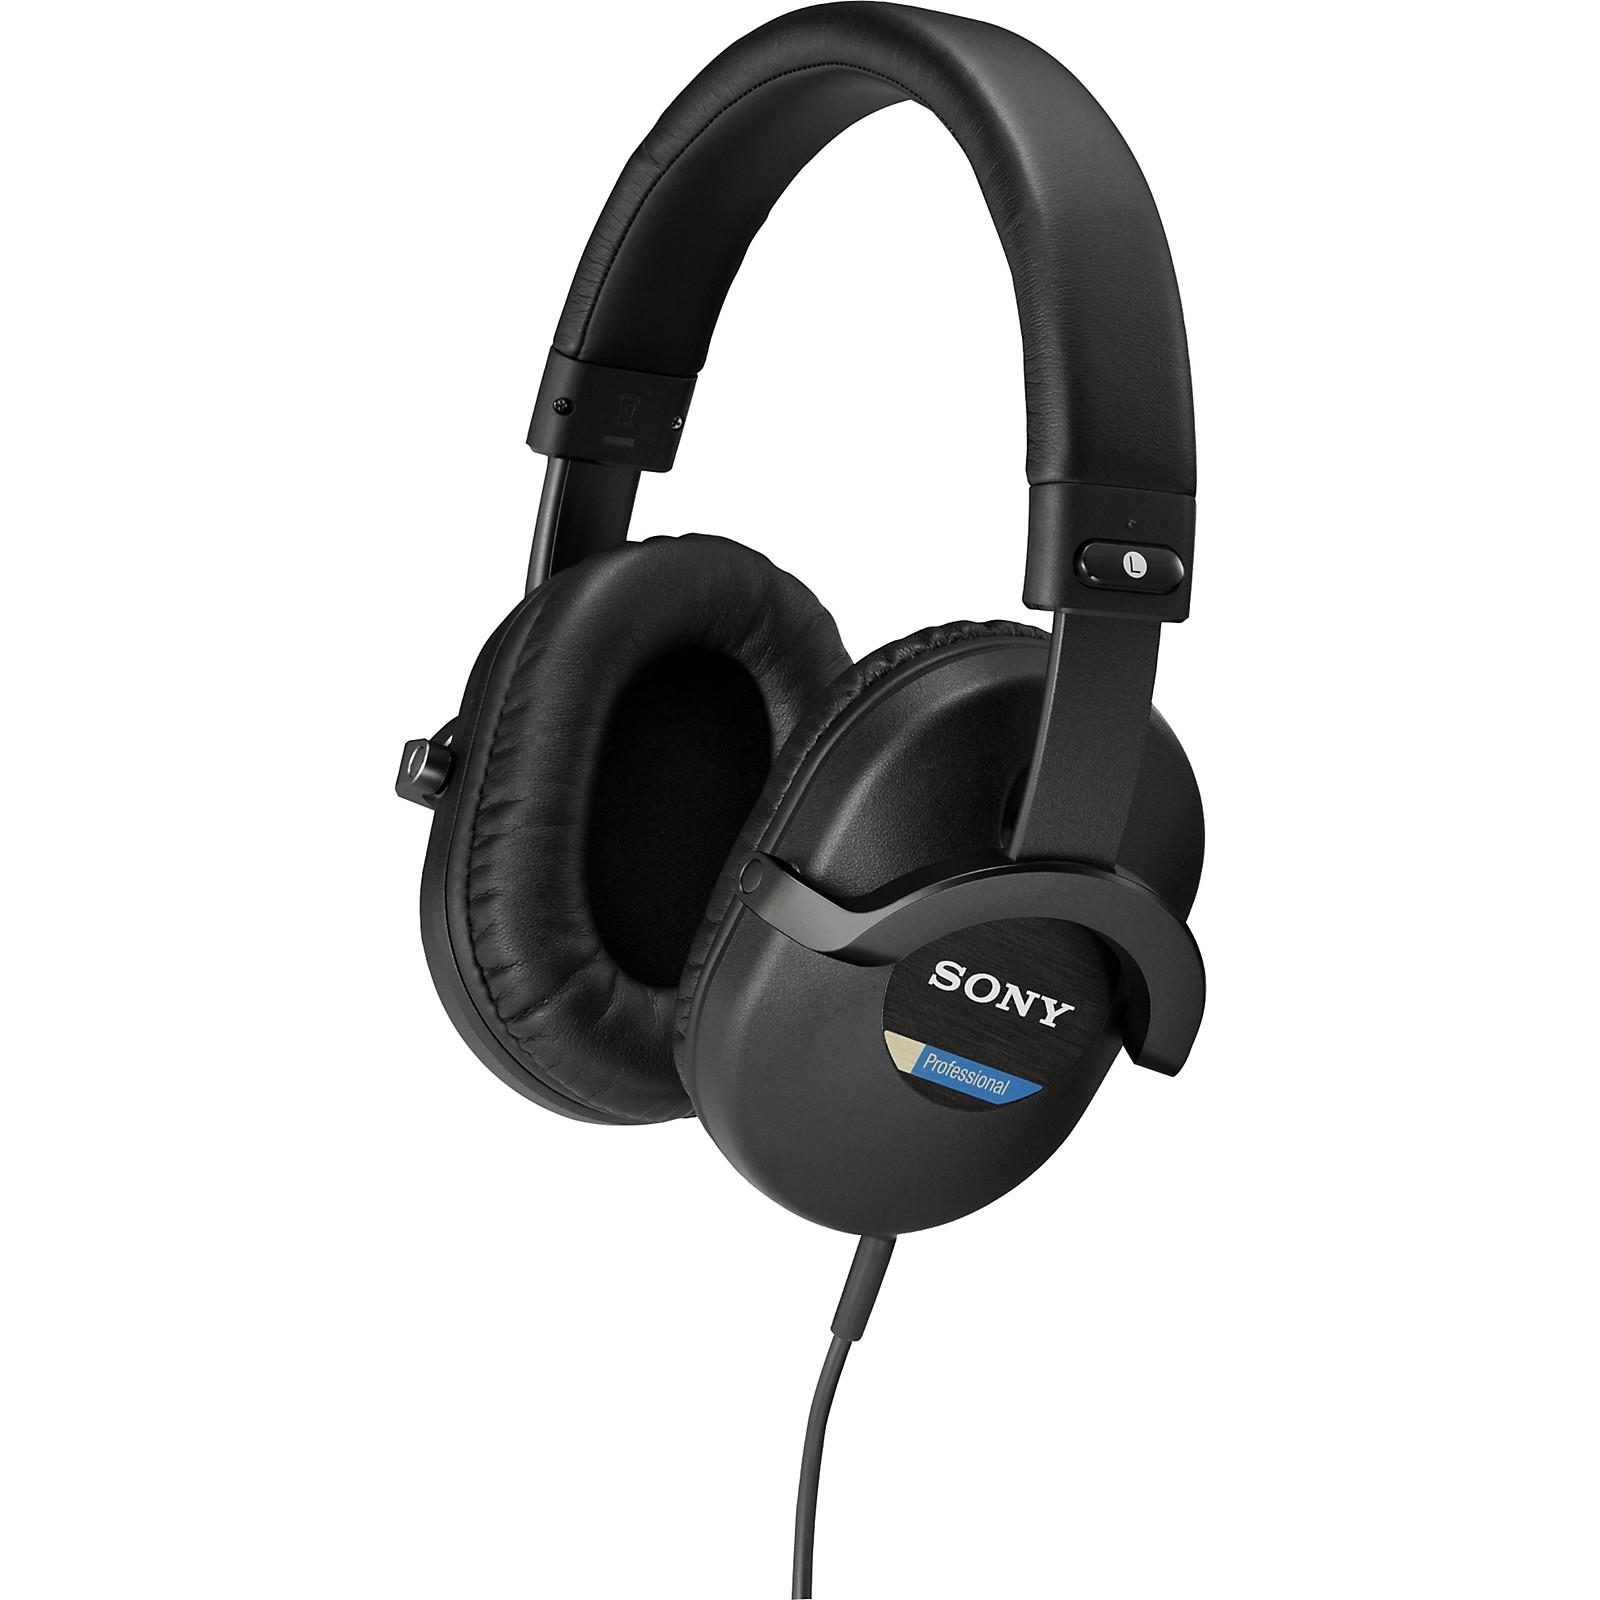 Open Box Sony MDR-7510 Professional Headphone